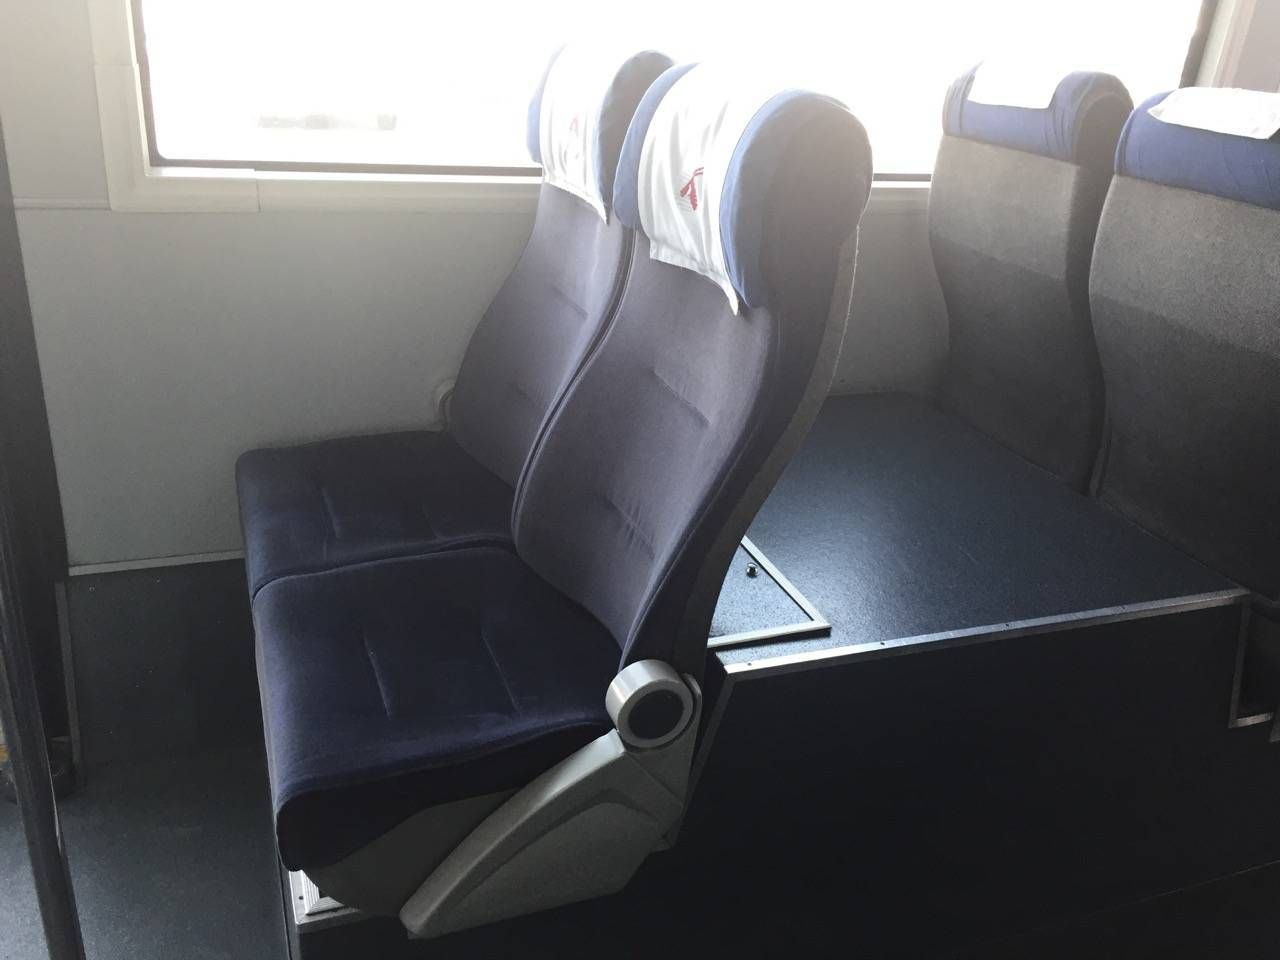 Qatar Business B777-300ER -02